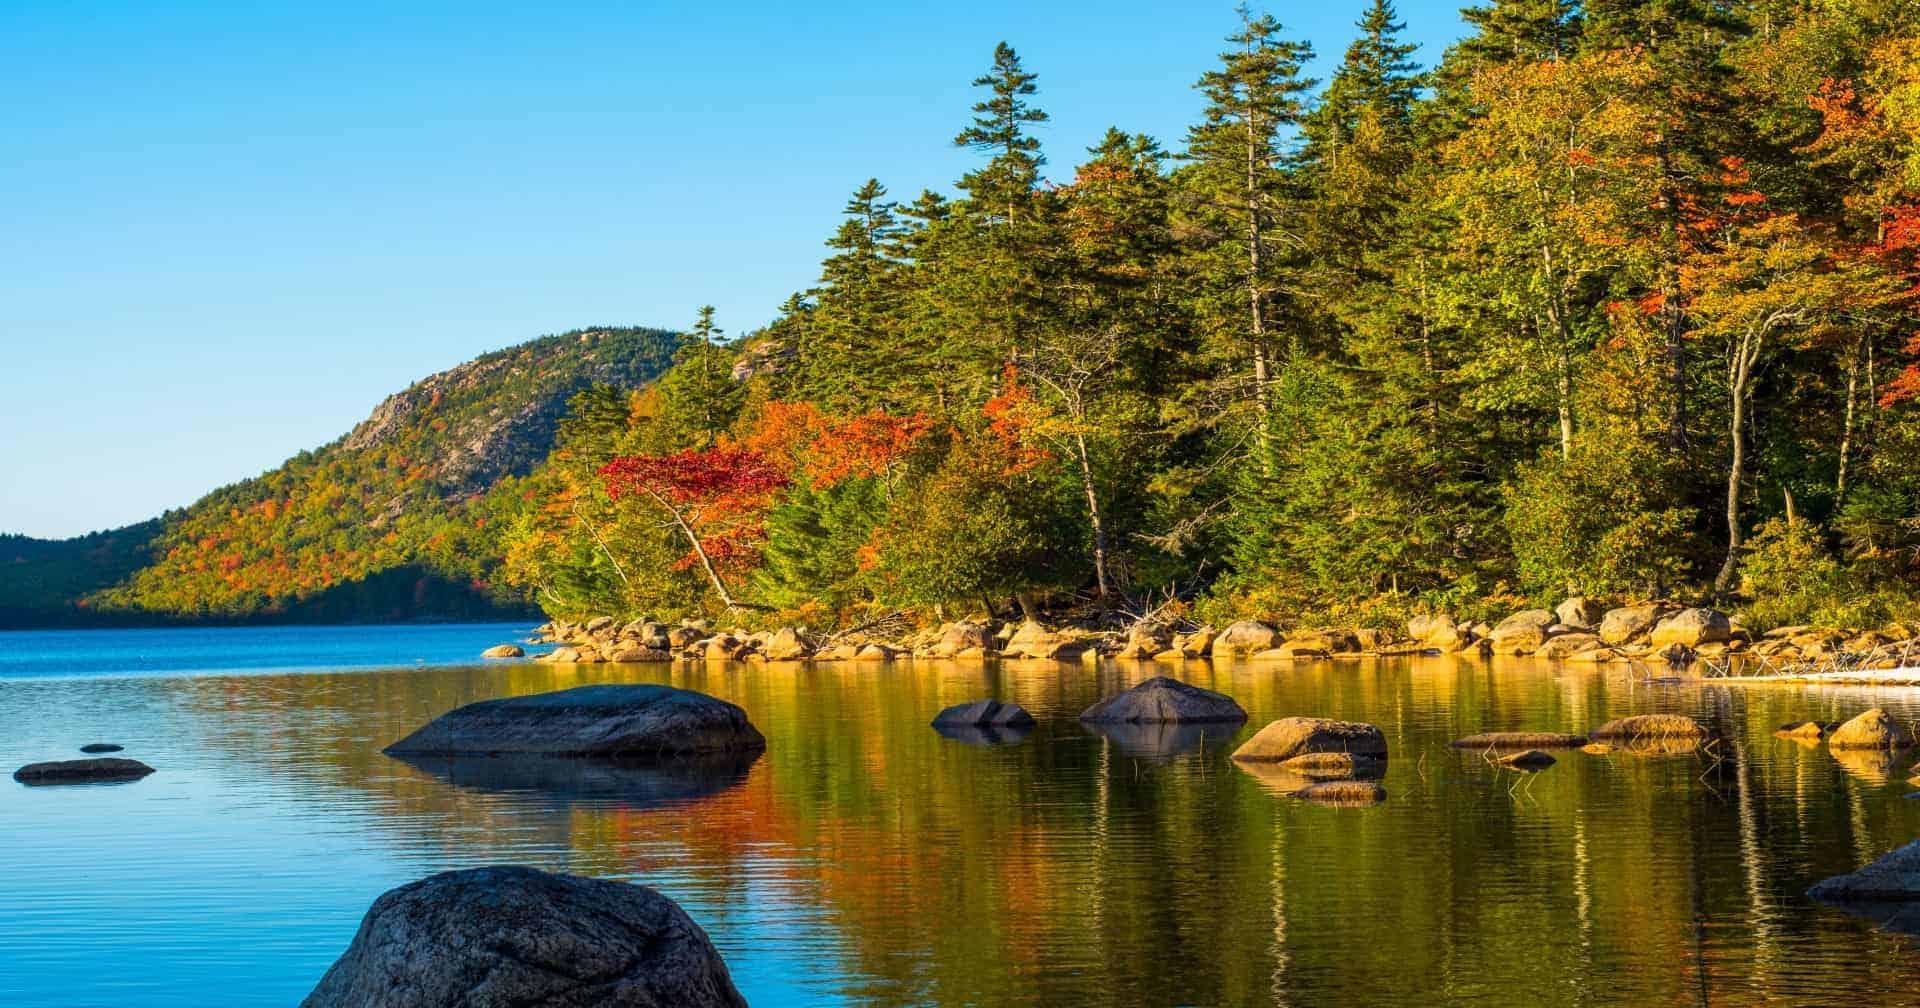 Jordan Pond in Acadia National Park Maine